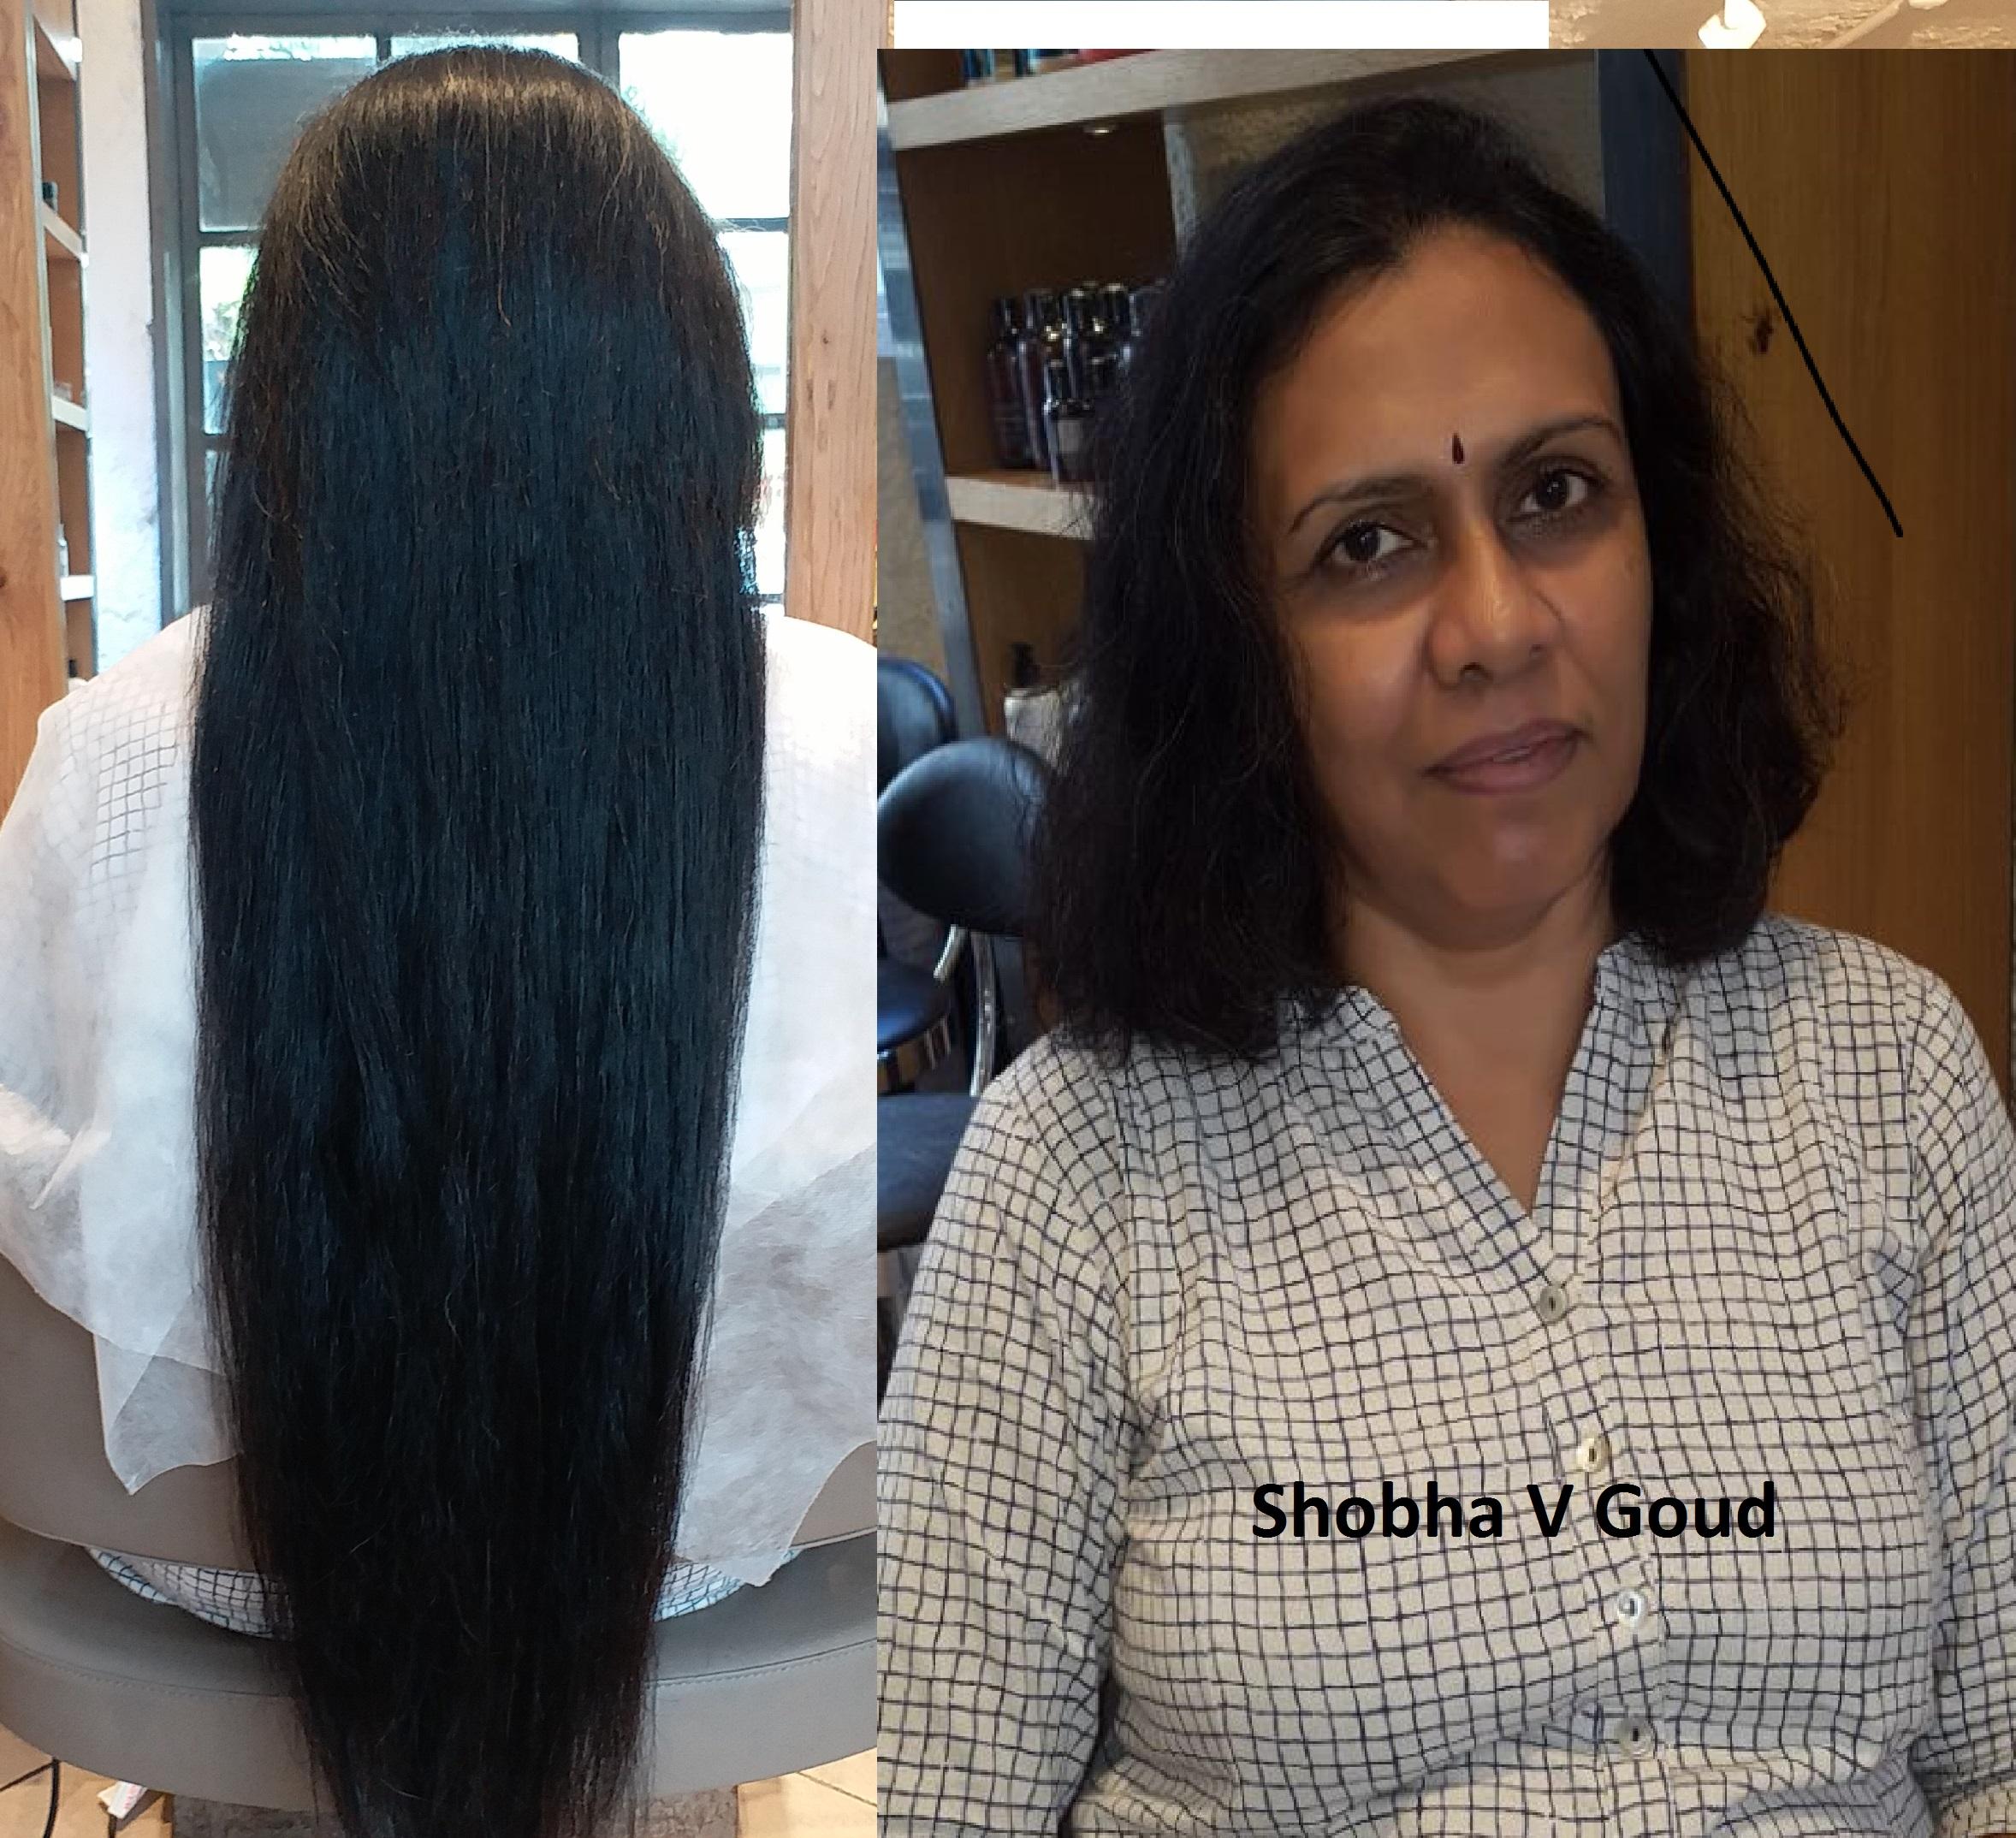 Shobha V Goud